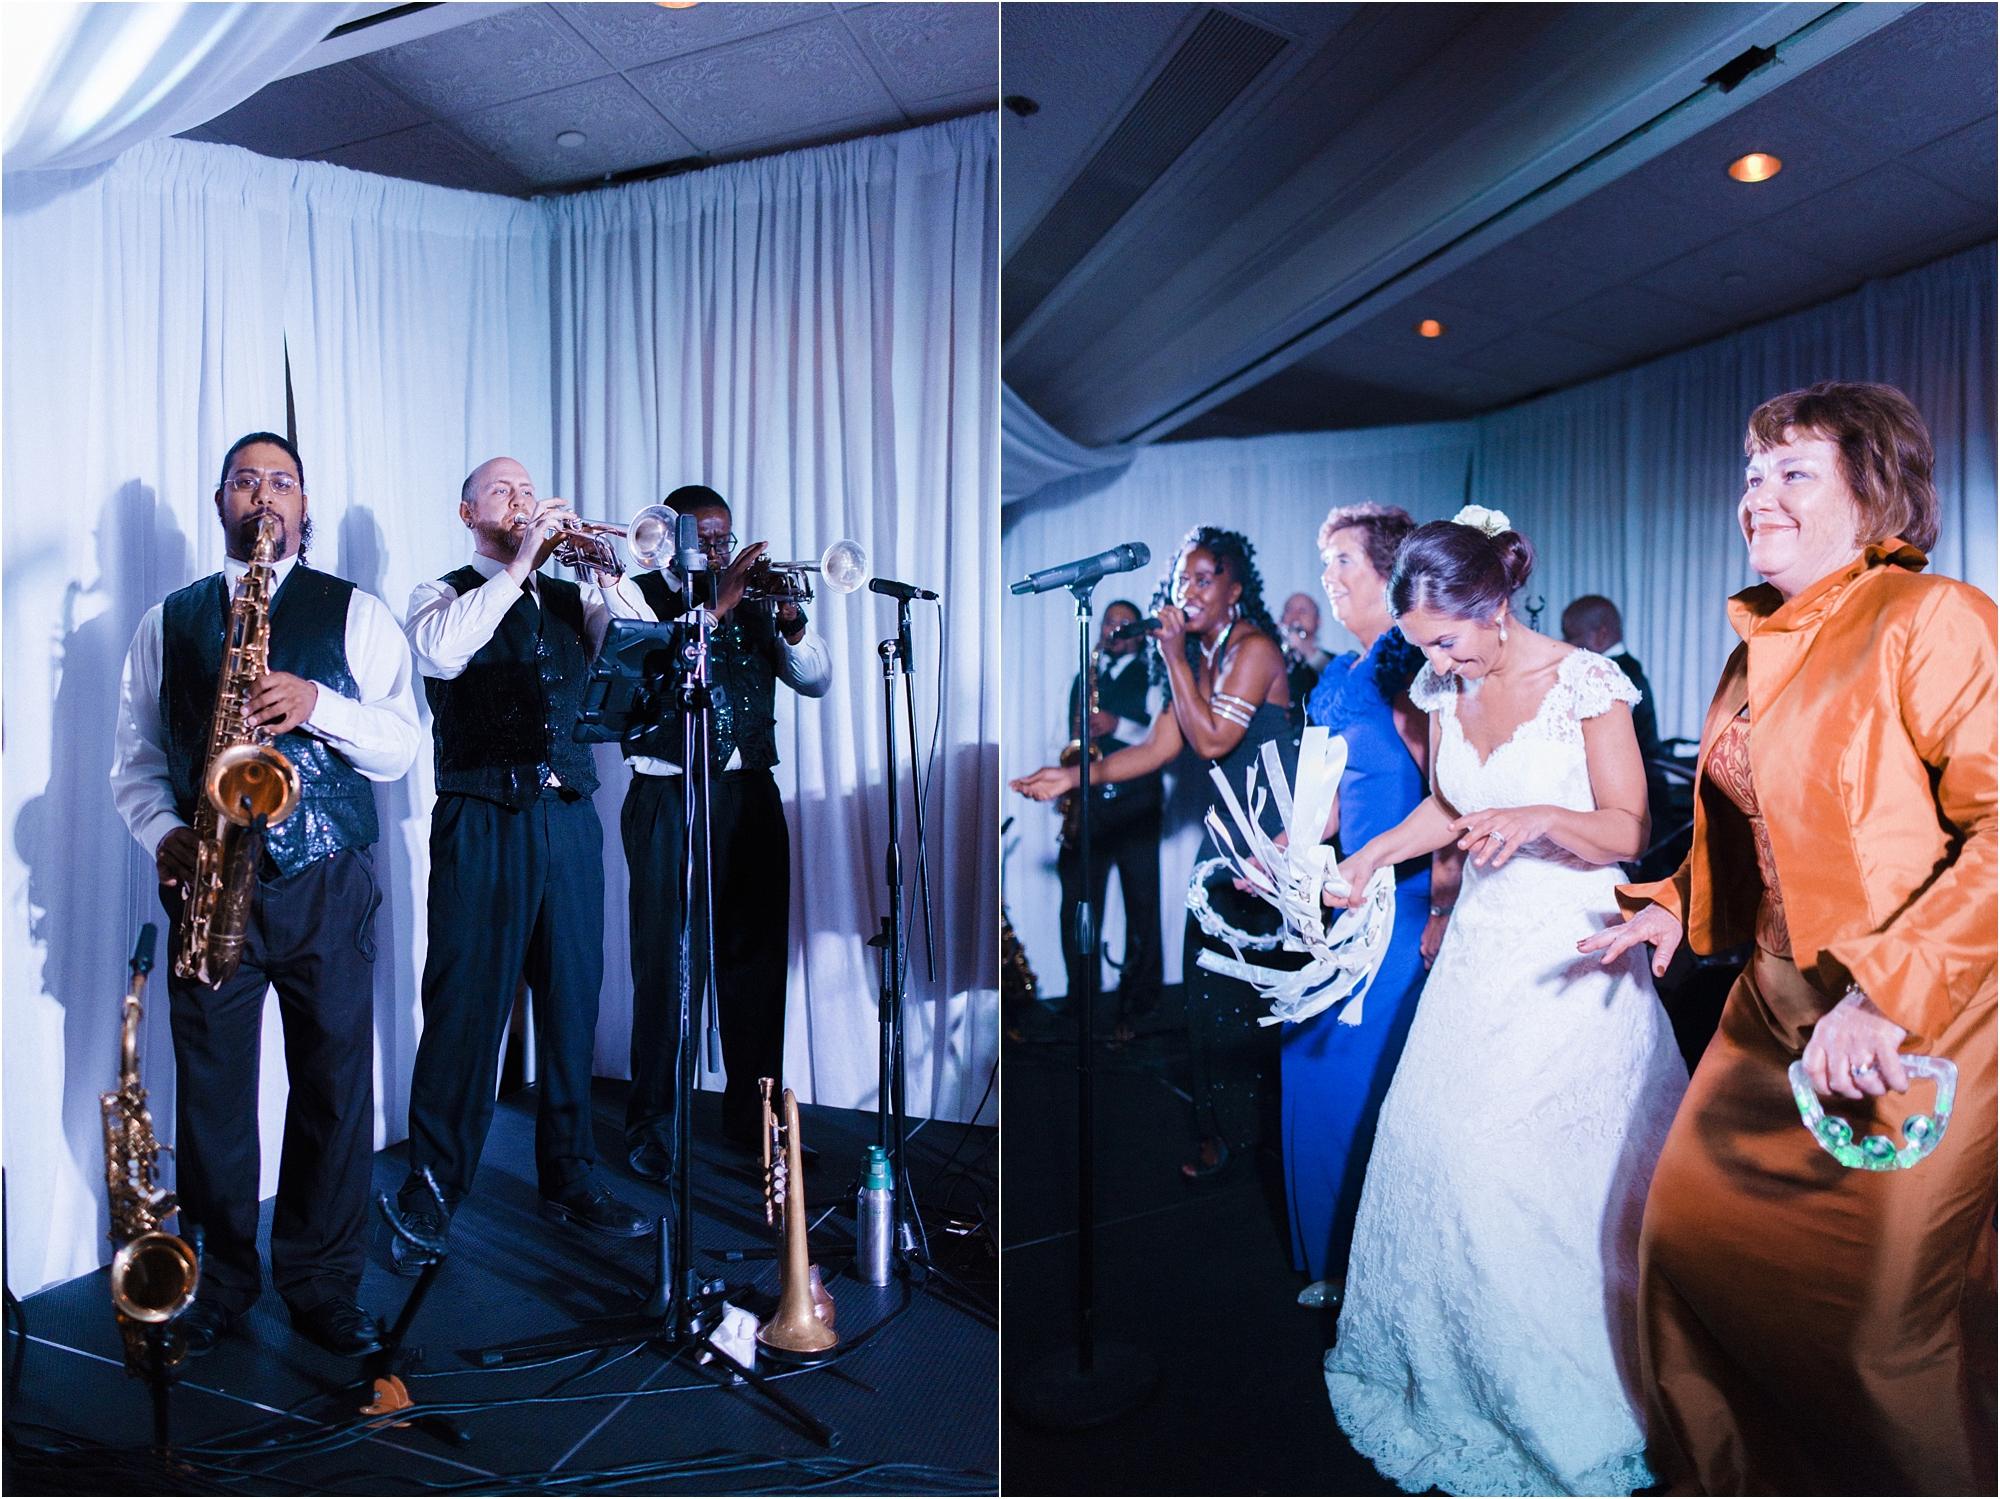 stephanie-yonce-photography-richmond-virginia-country-club-wedding-photo_047.JPG